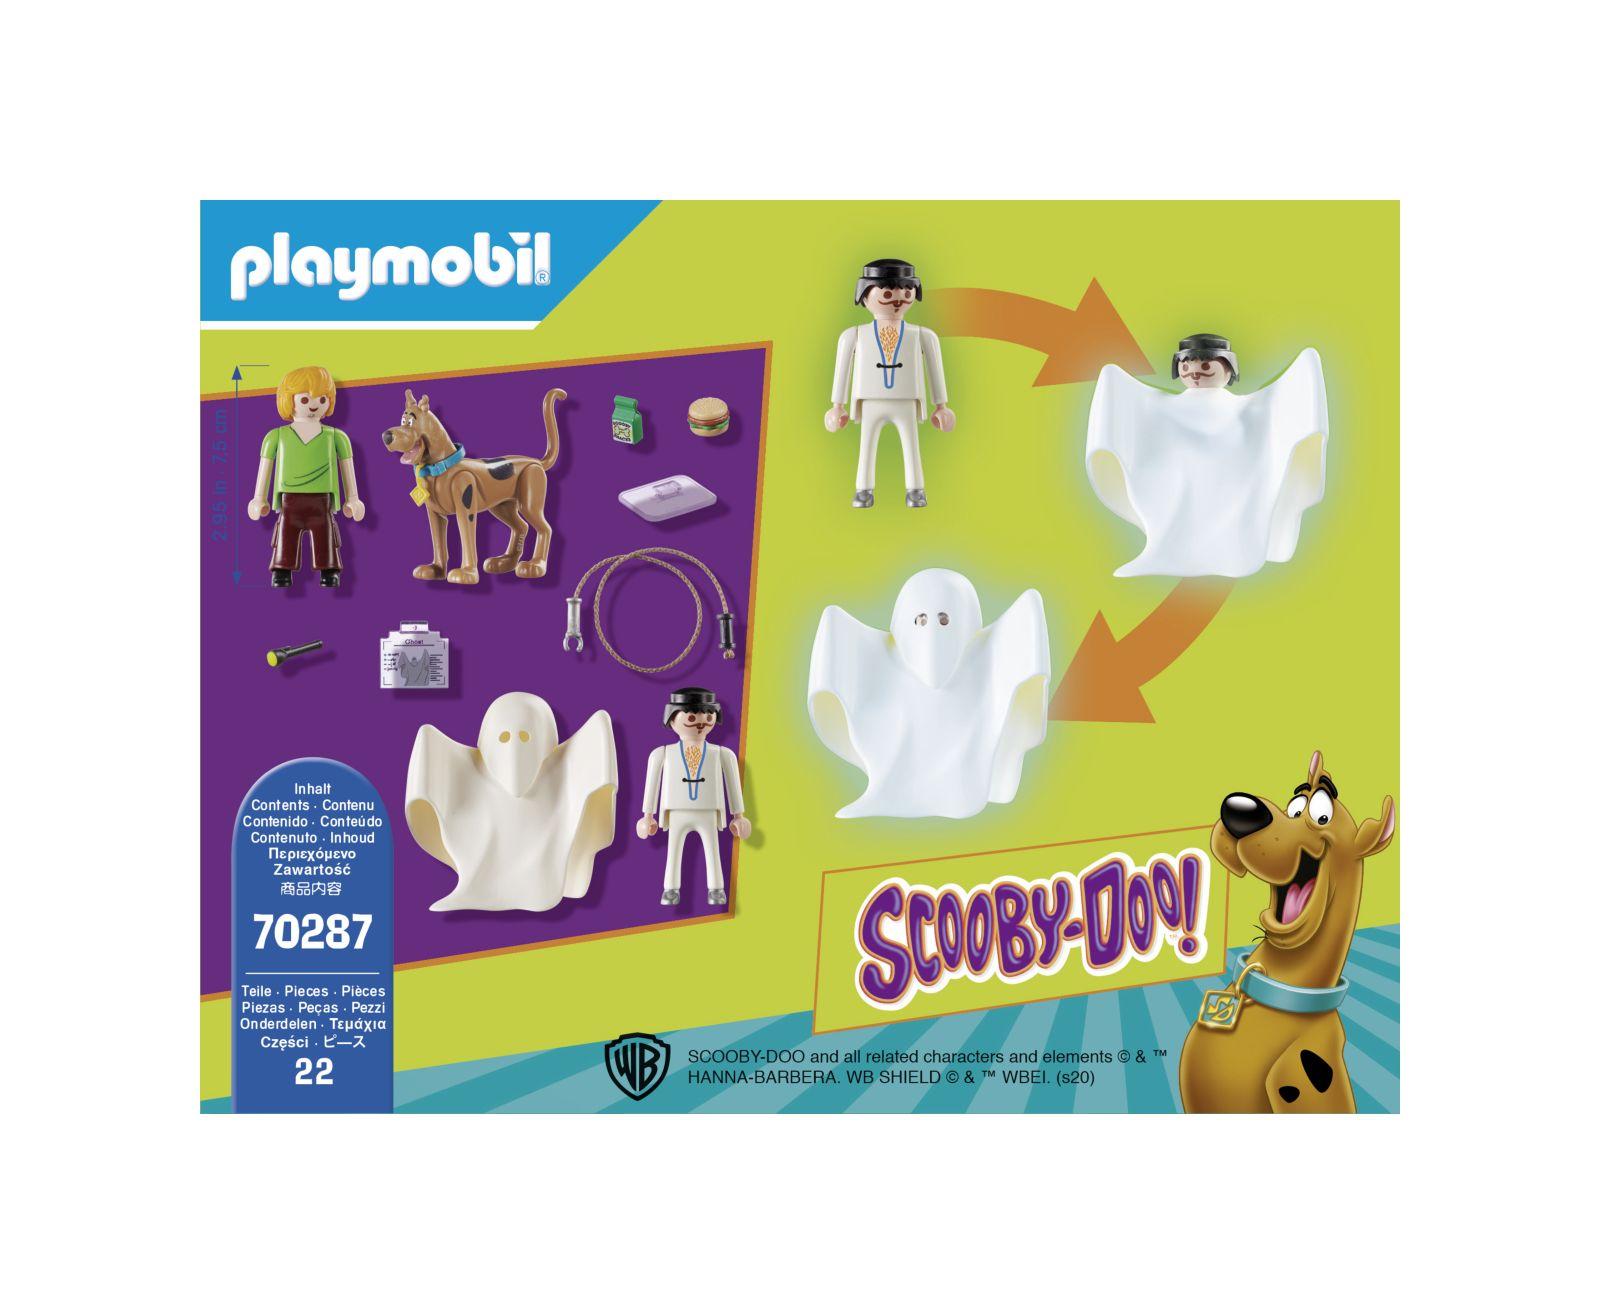 Scooby-doo! scooby & shaggy - Playmobil